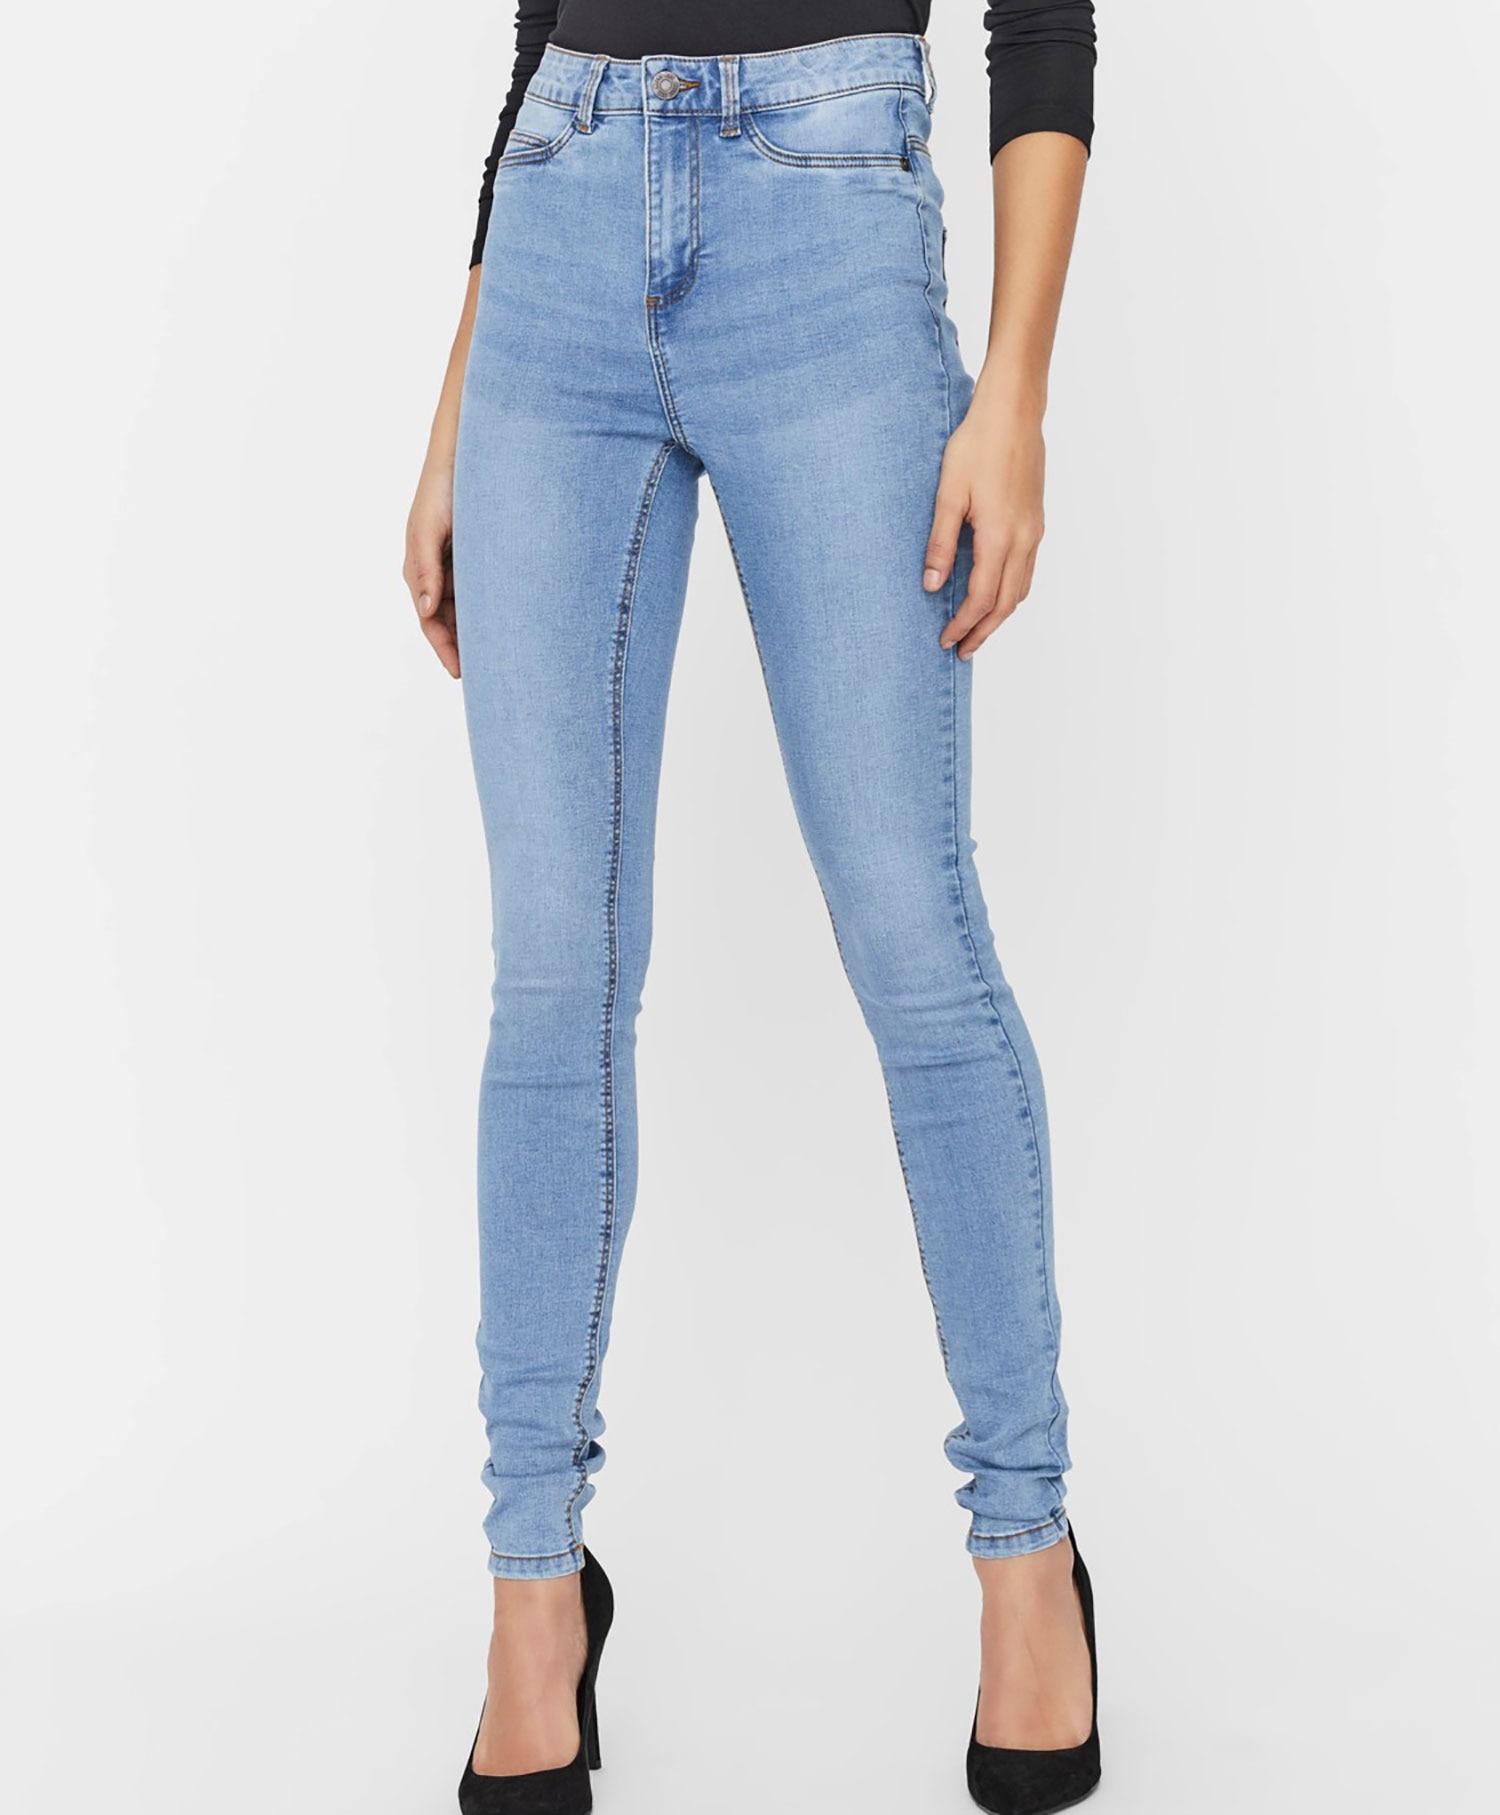 Noisy May Callie jeans